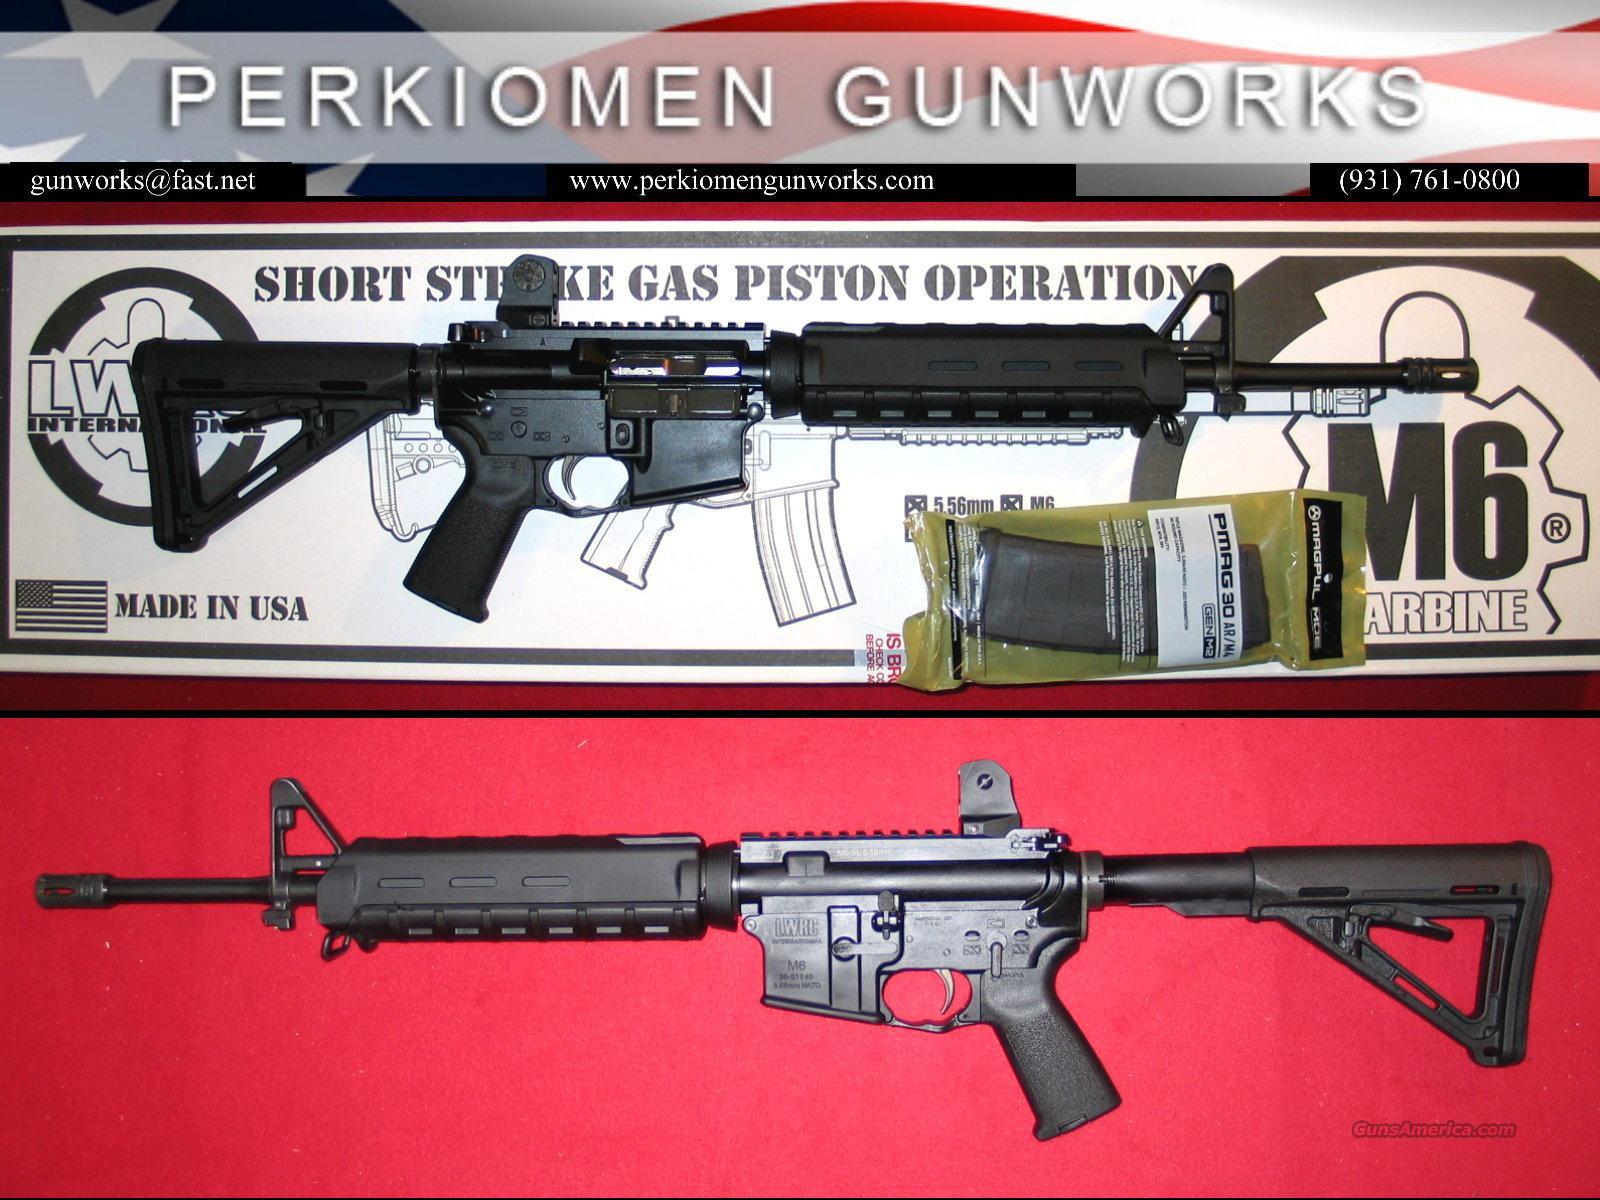 LWRC M6-SL, 5.56 STR-LW AR M4 Carbine  Guns > Rifles > AR-15 Rifles - Small Manufacturers > Complete Rifle